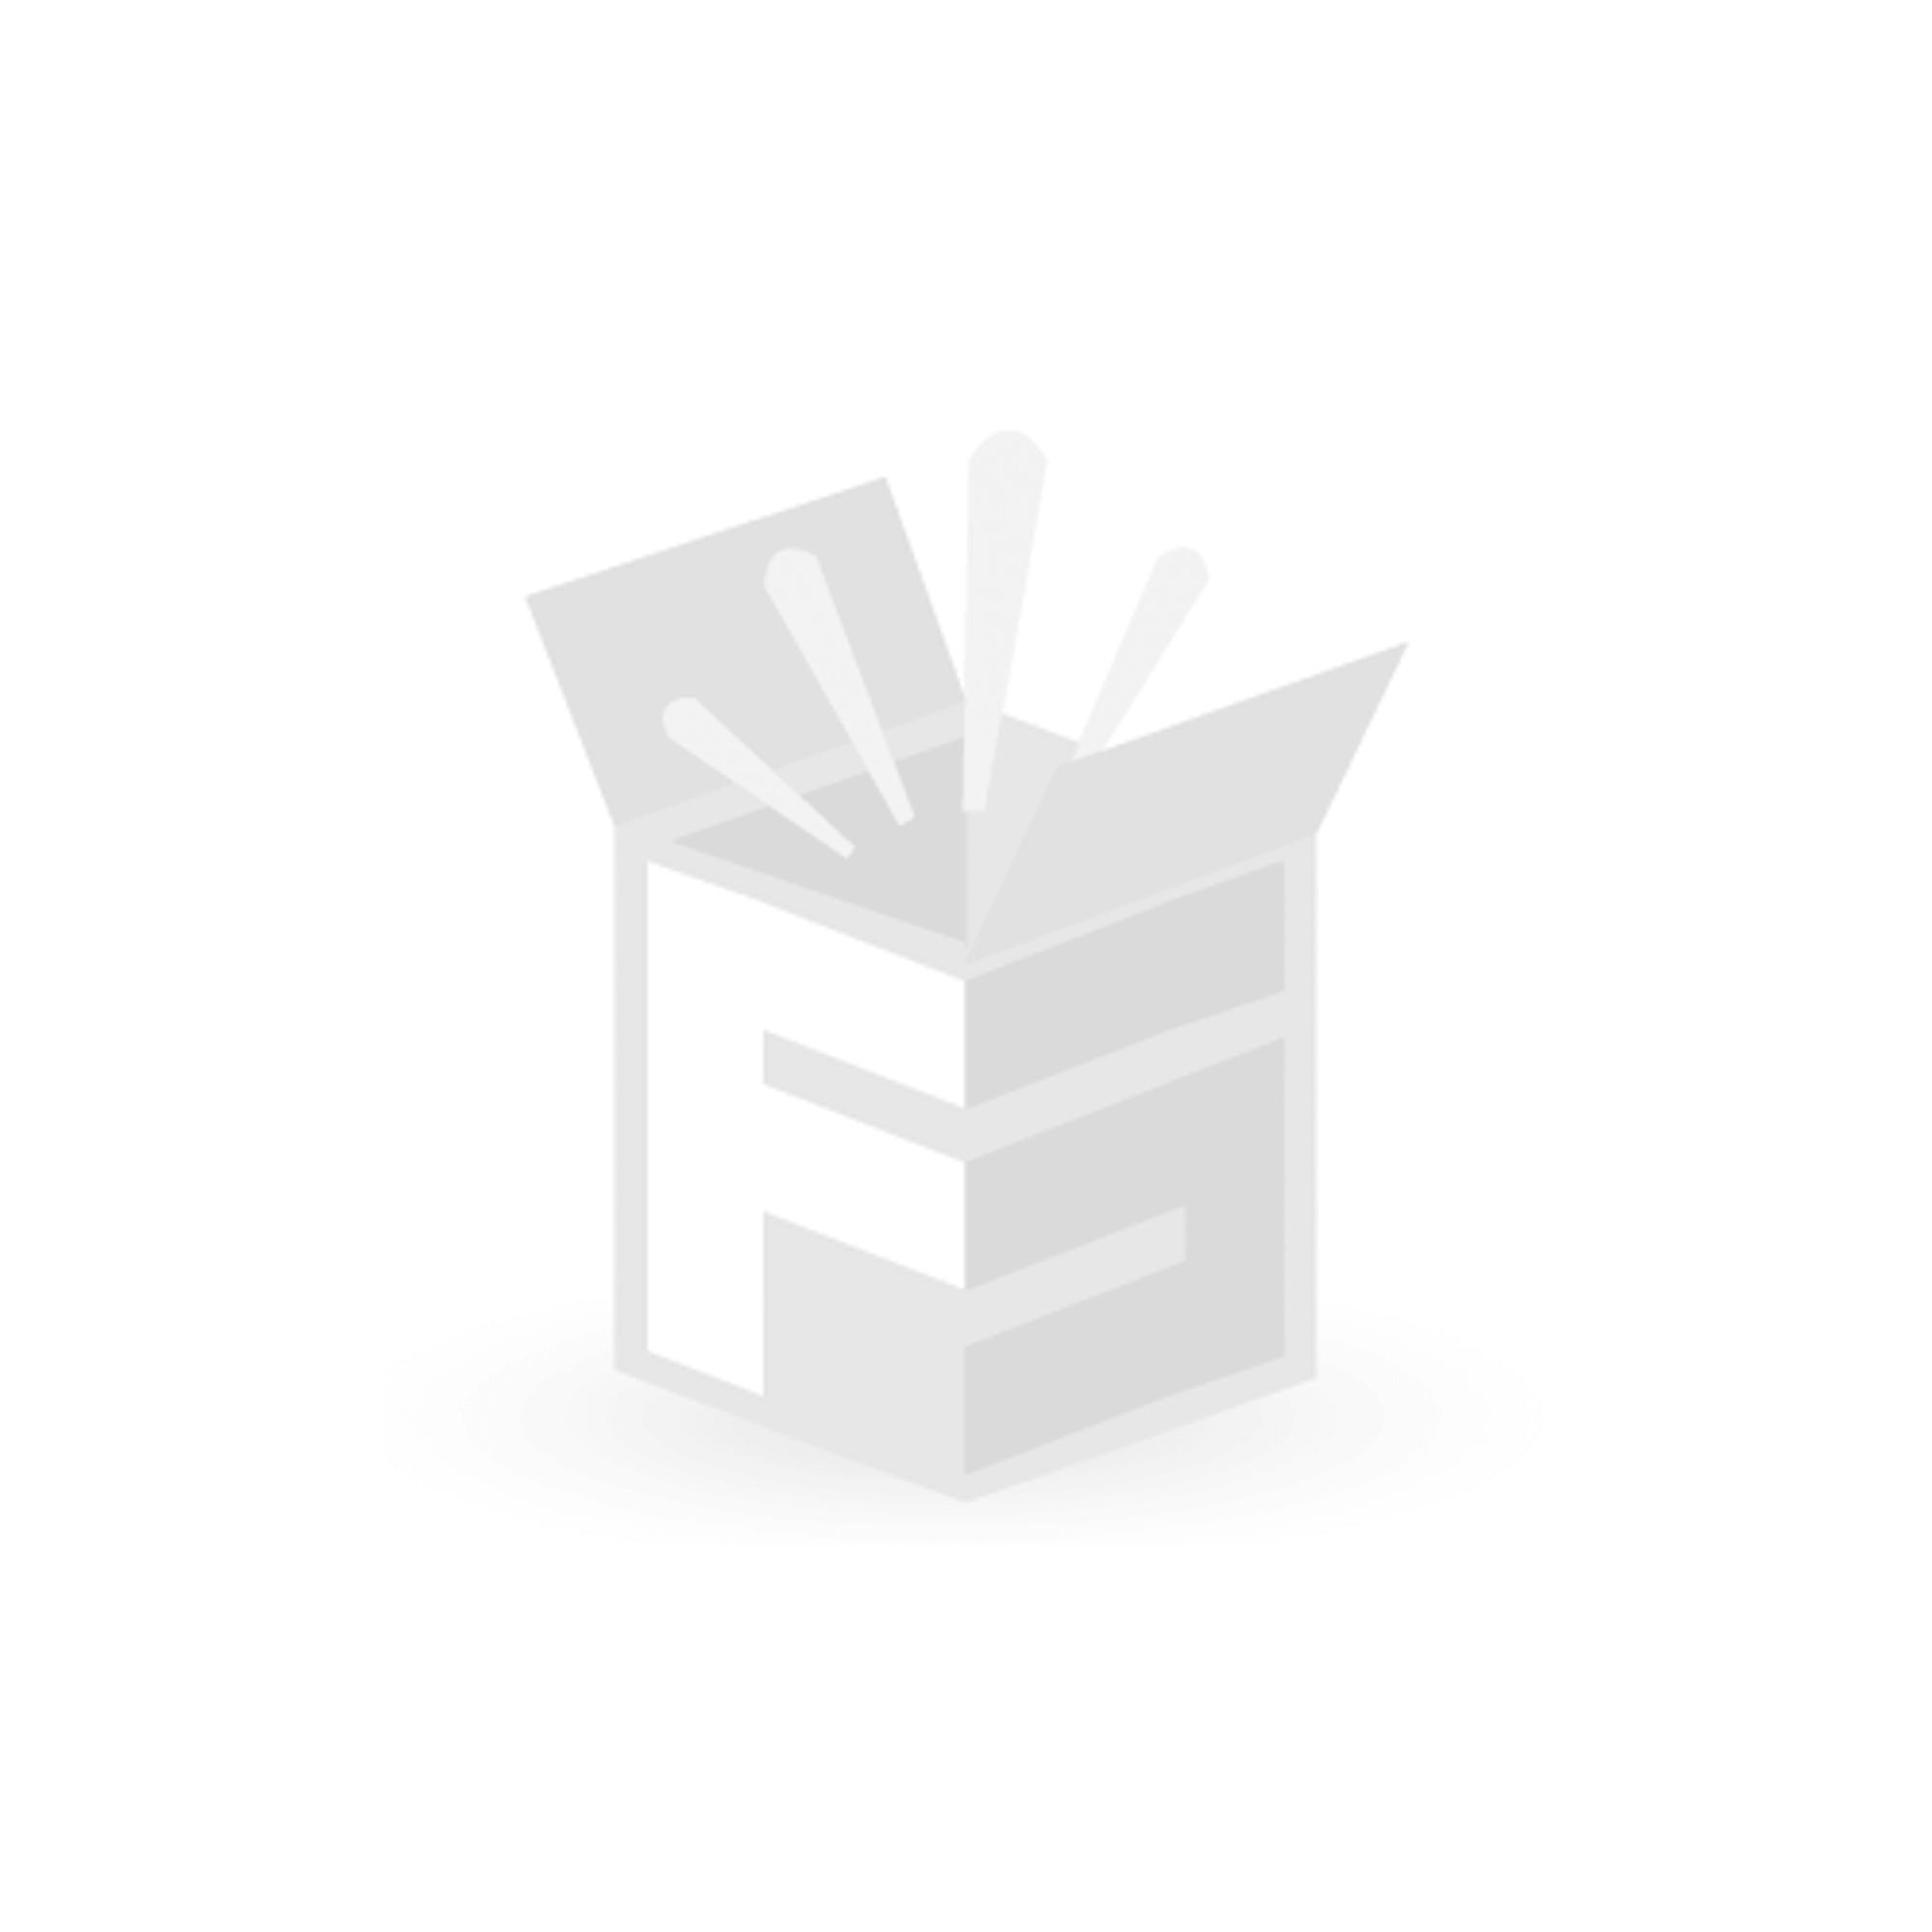 bosch akku bohrschrauber gsr 18v 21 3x 2 0 ah inkl koffer. Black Bedroom Furniture Sets. Home Design Ideas